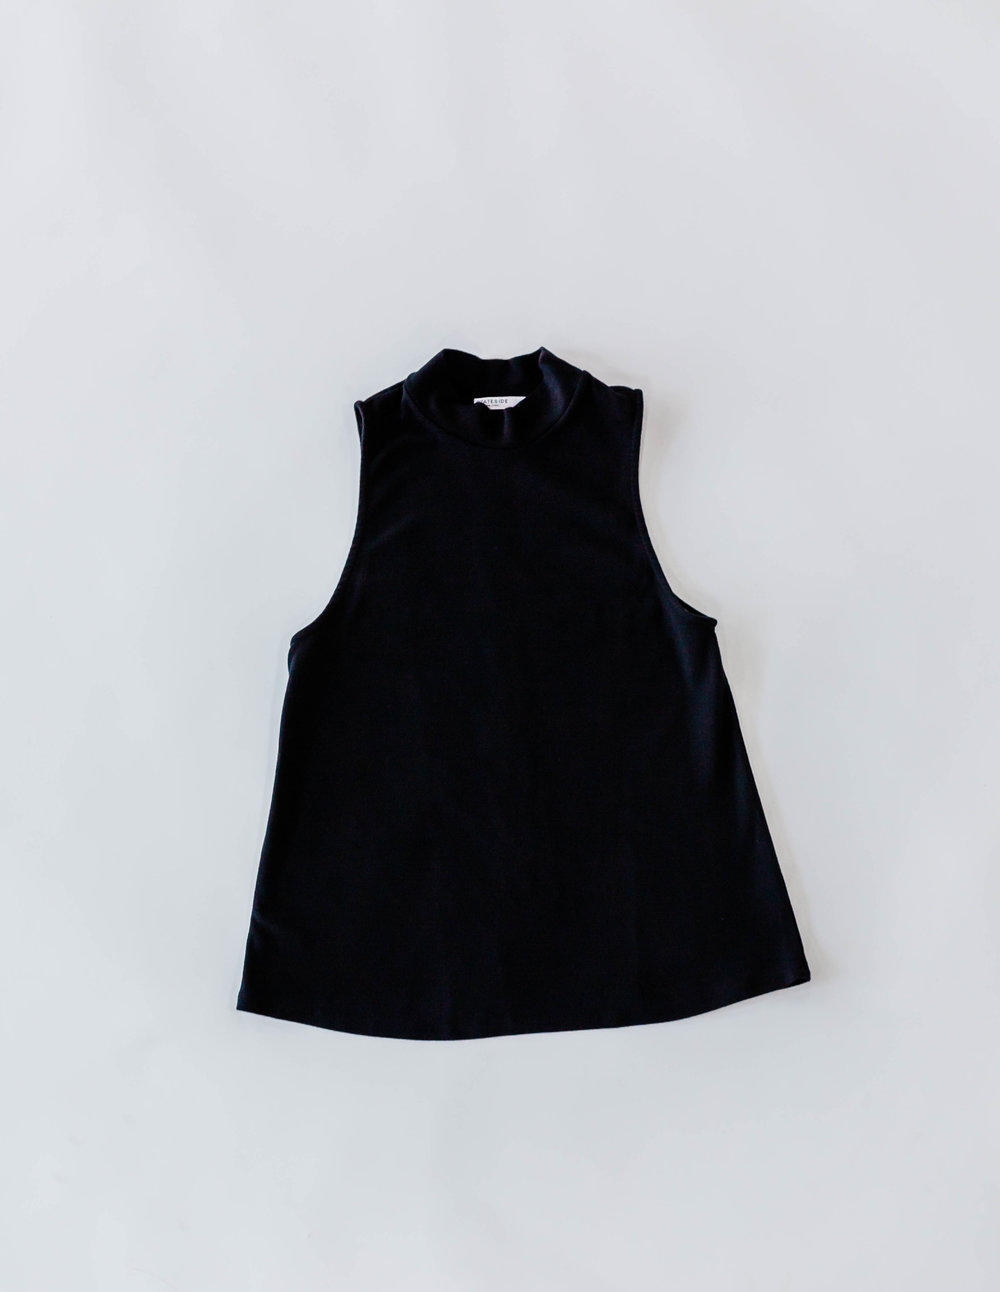 A Black Shirt - shopstateside.us